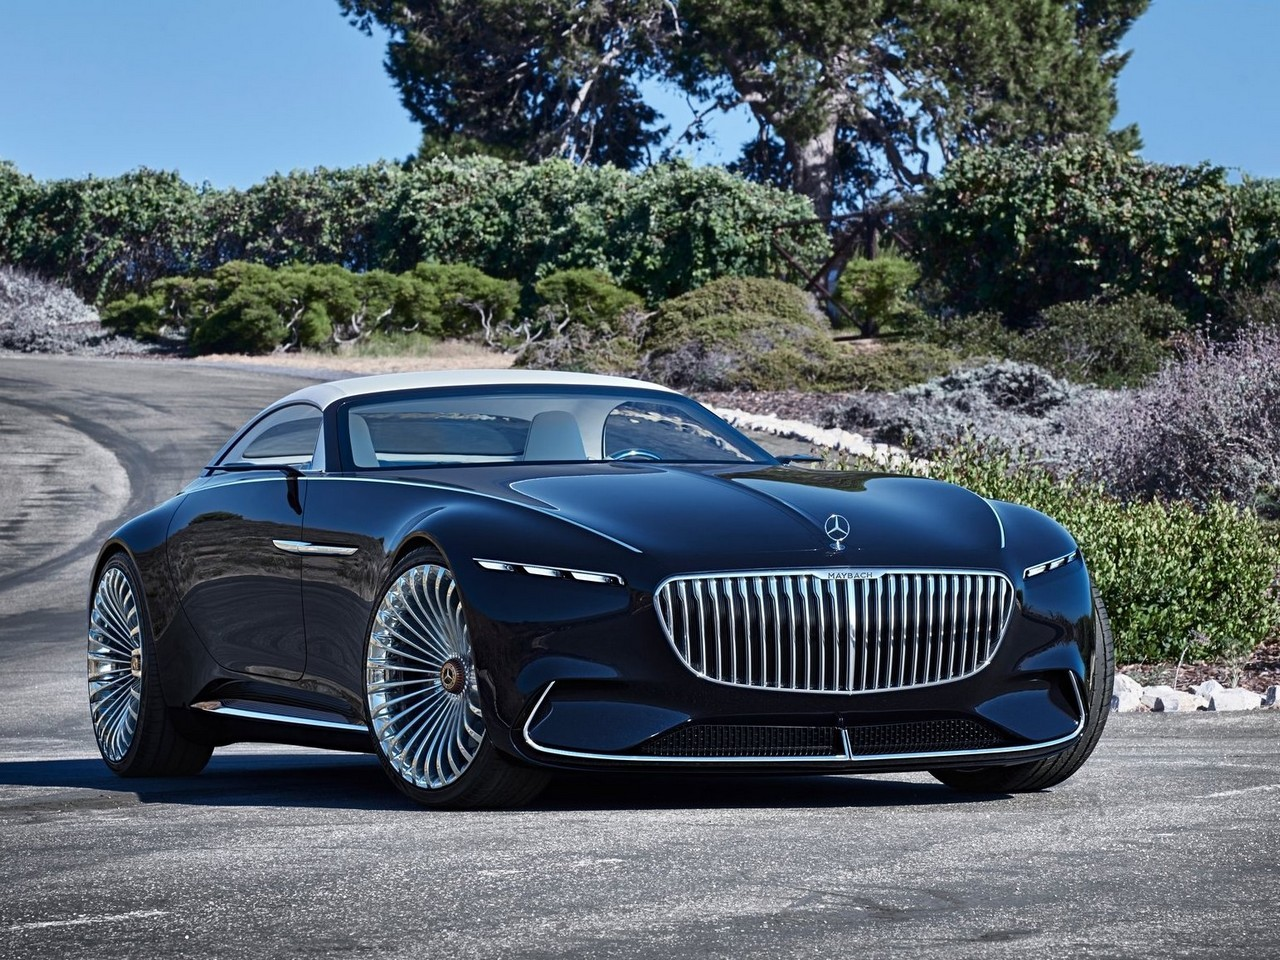 vision mercedes maybach 6 cabriolet 100 lectrique et 750 chevaux. Black Bedroom Furniture Sets. Home Design Ideas